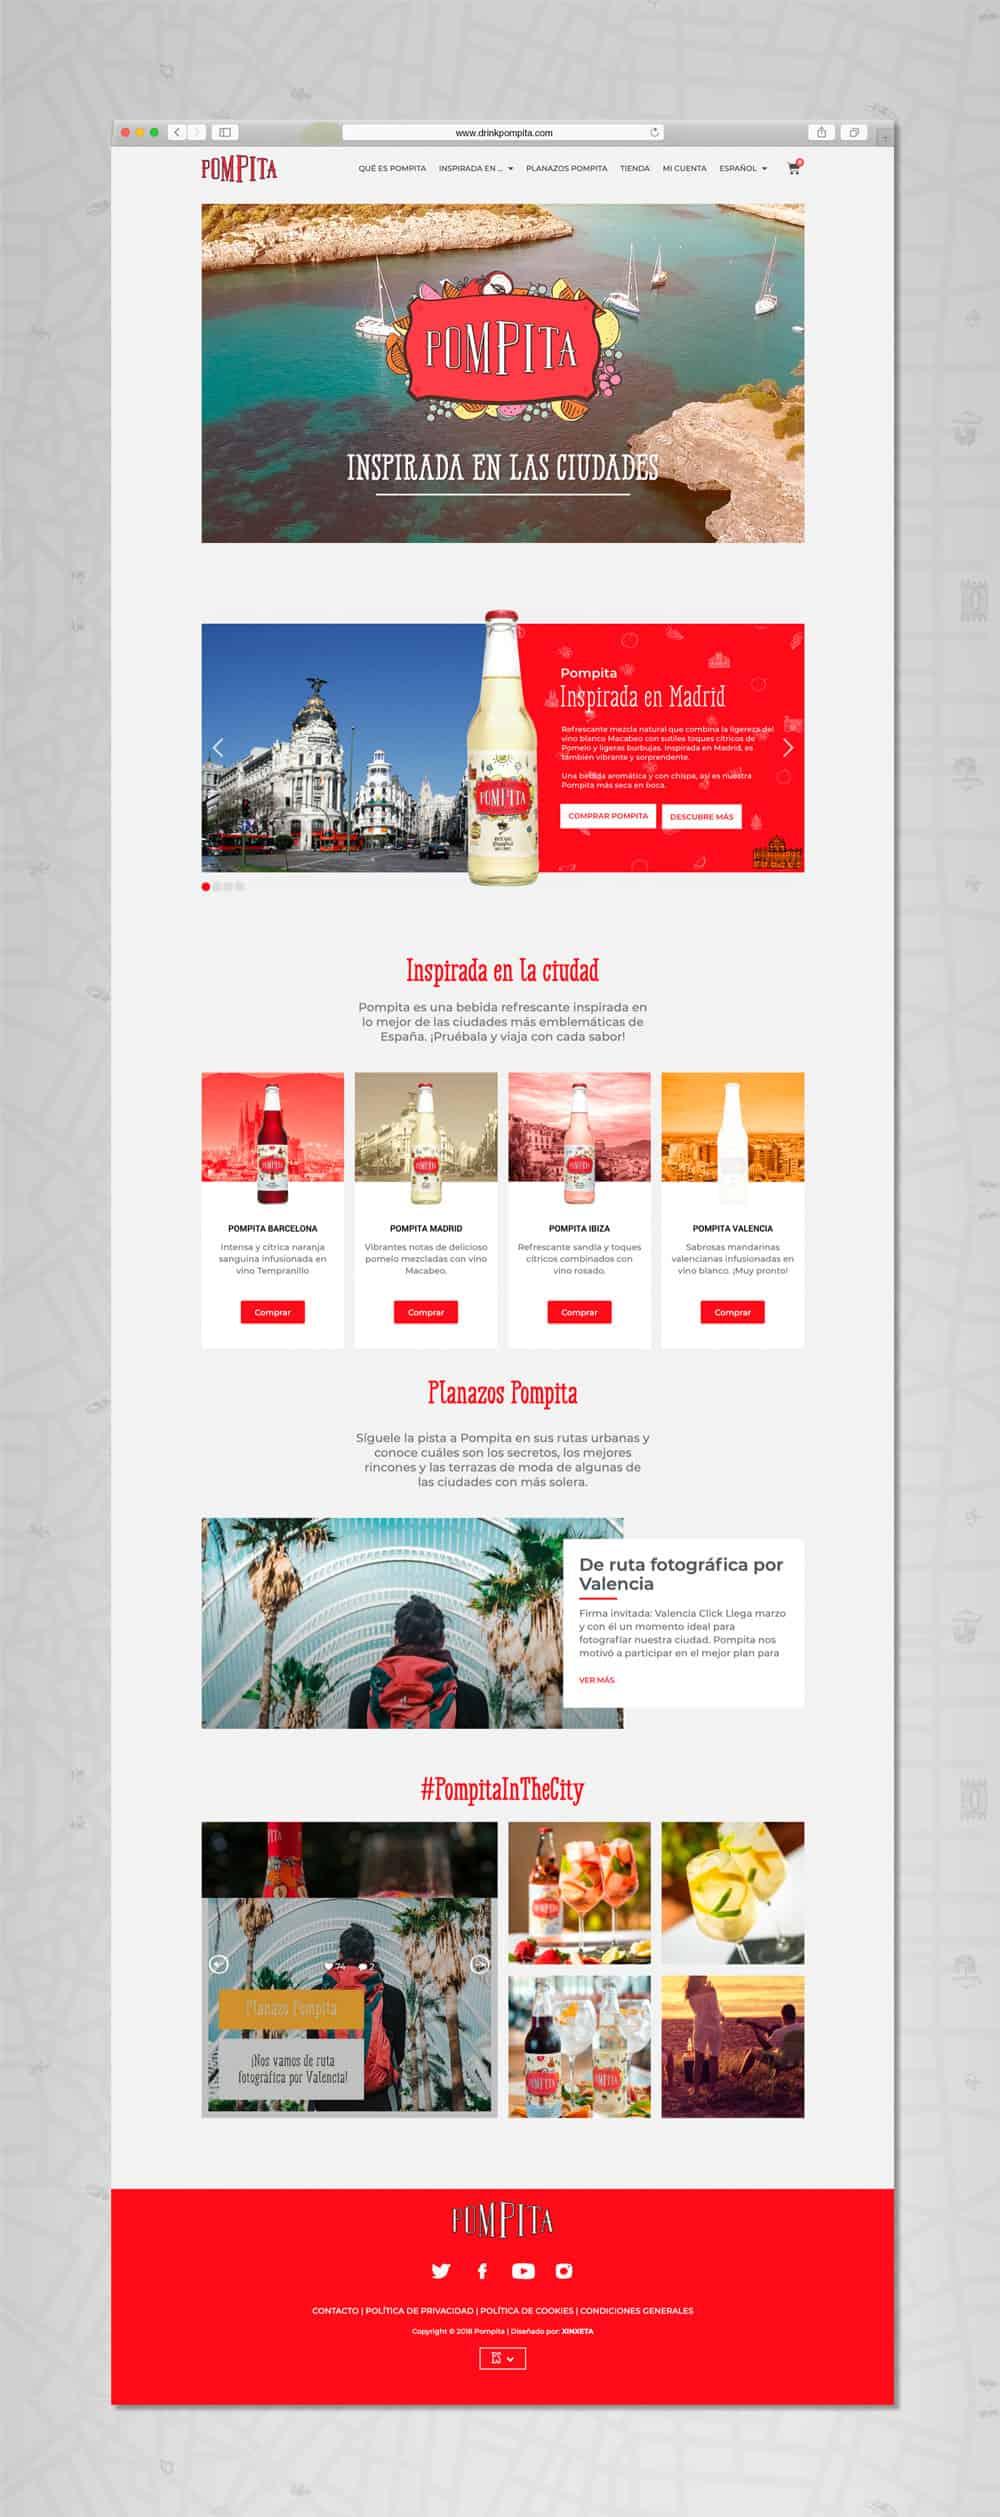 Pompita - Versión web Home